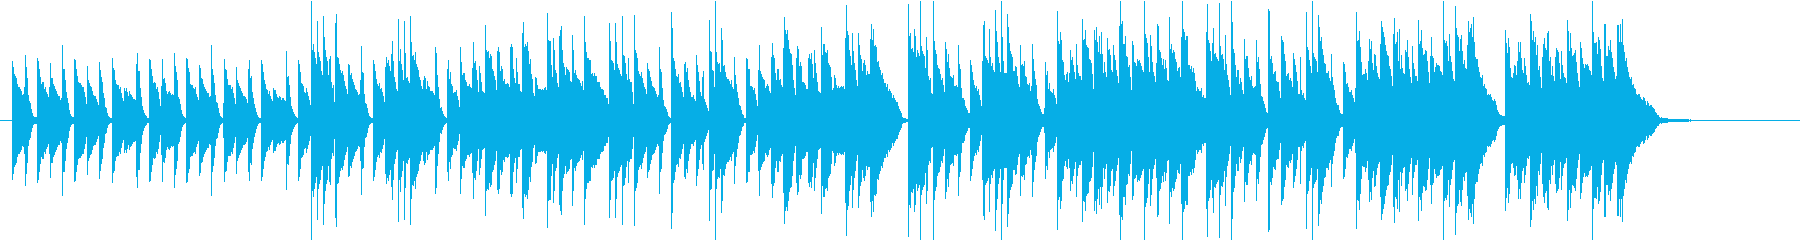 Gentle waltz, acoustic sound's reproduced waveform